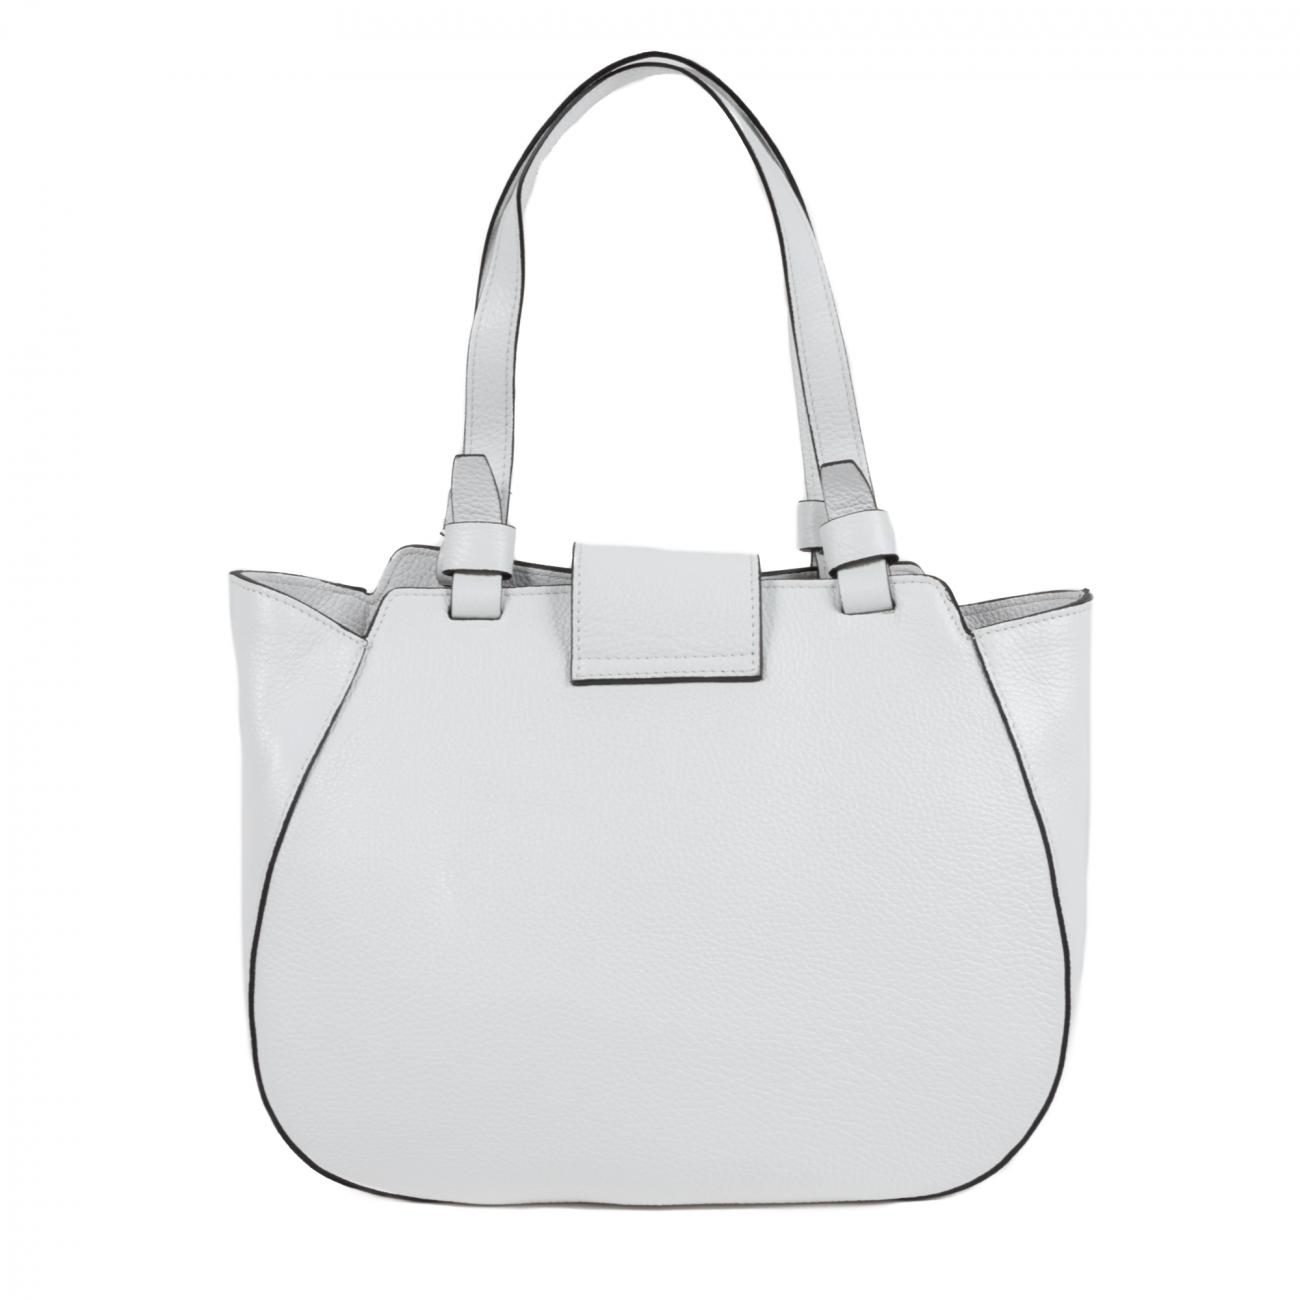 Dee Ocleppo Womens Handbag Q250 CERVO BIANCO